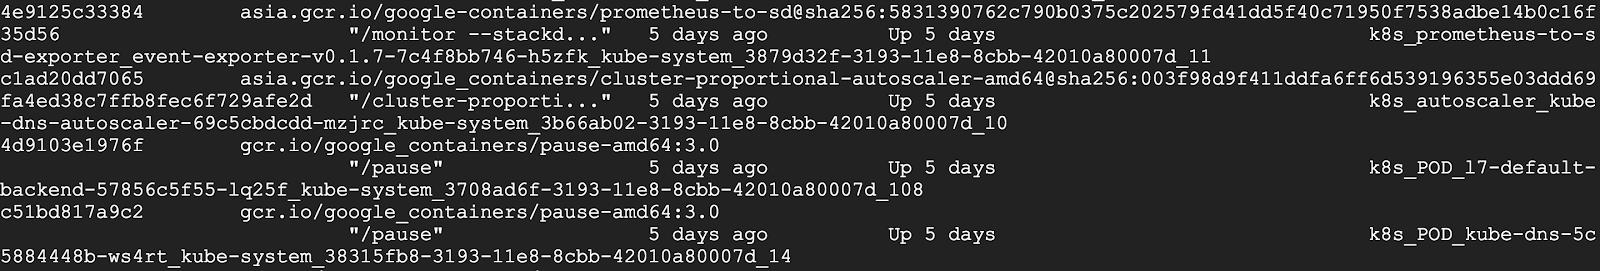 Интеграция containerd с Kubernetes, заменяющая Docker, готова к production - 7